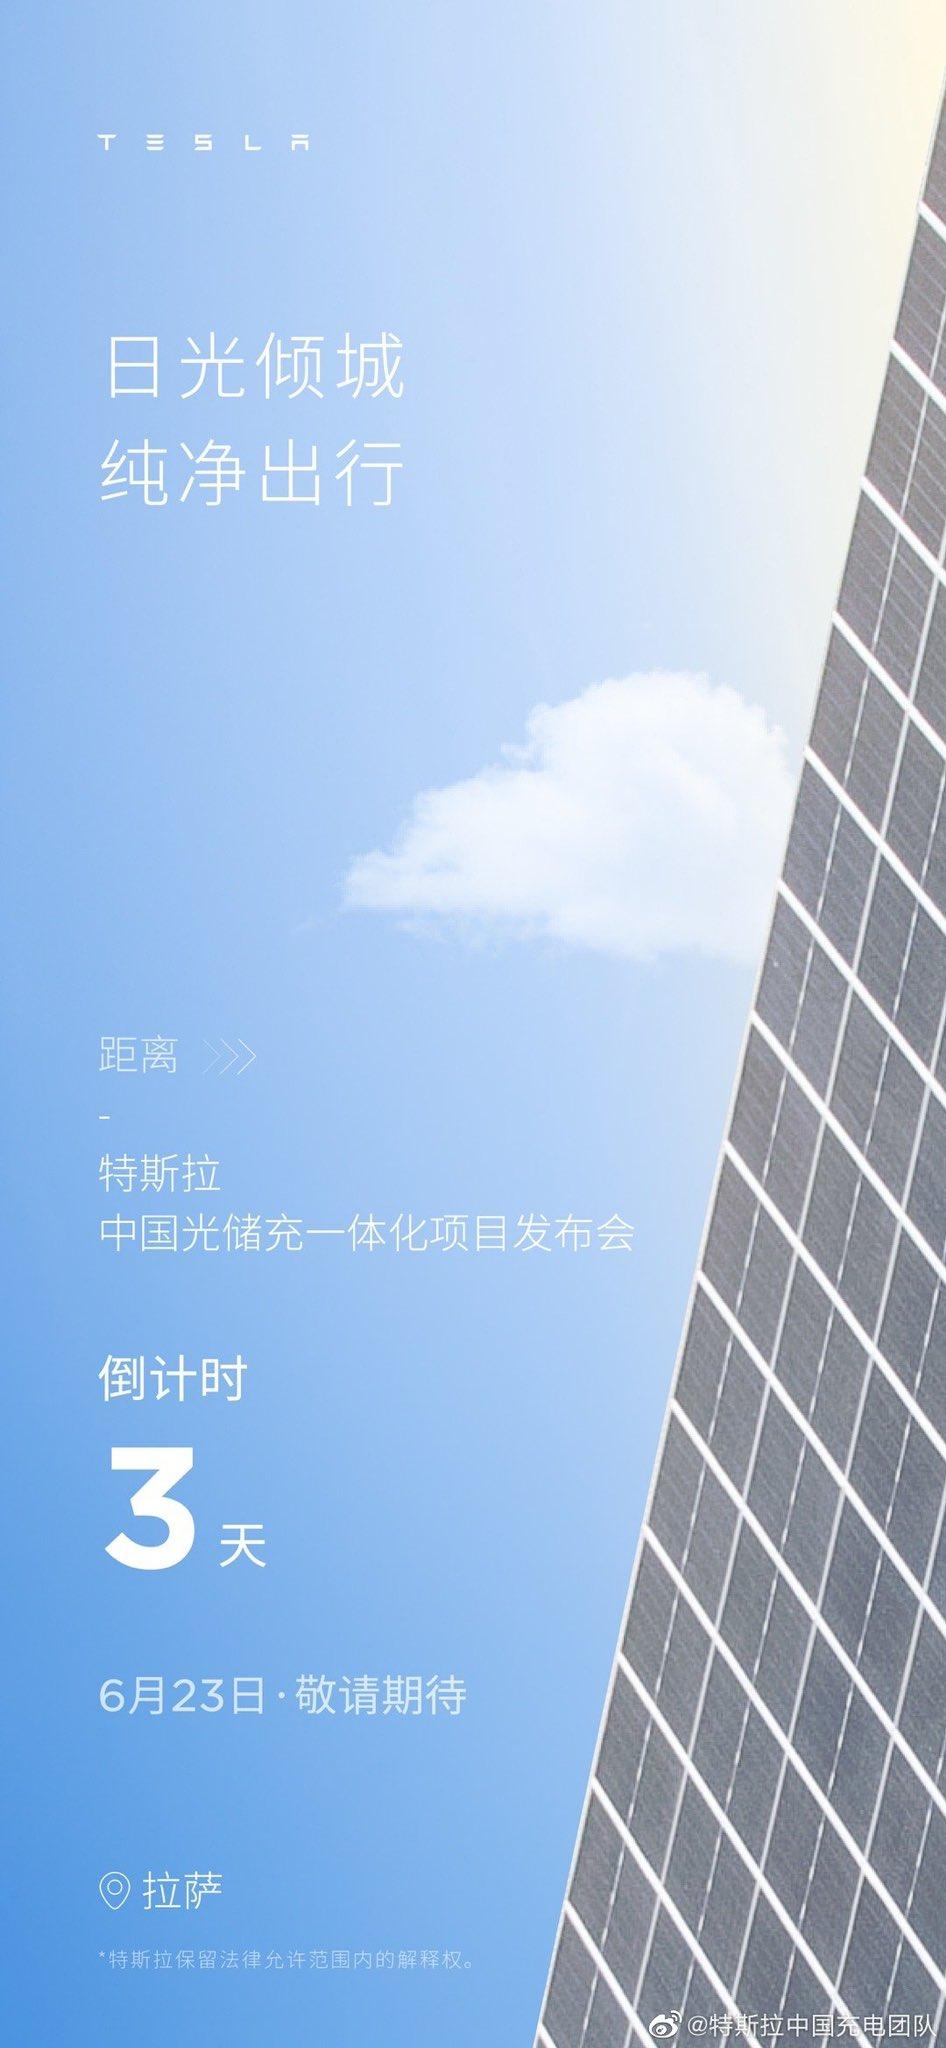 tesla-china-solar